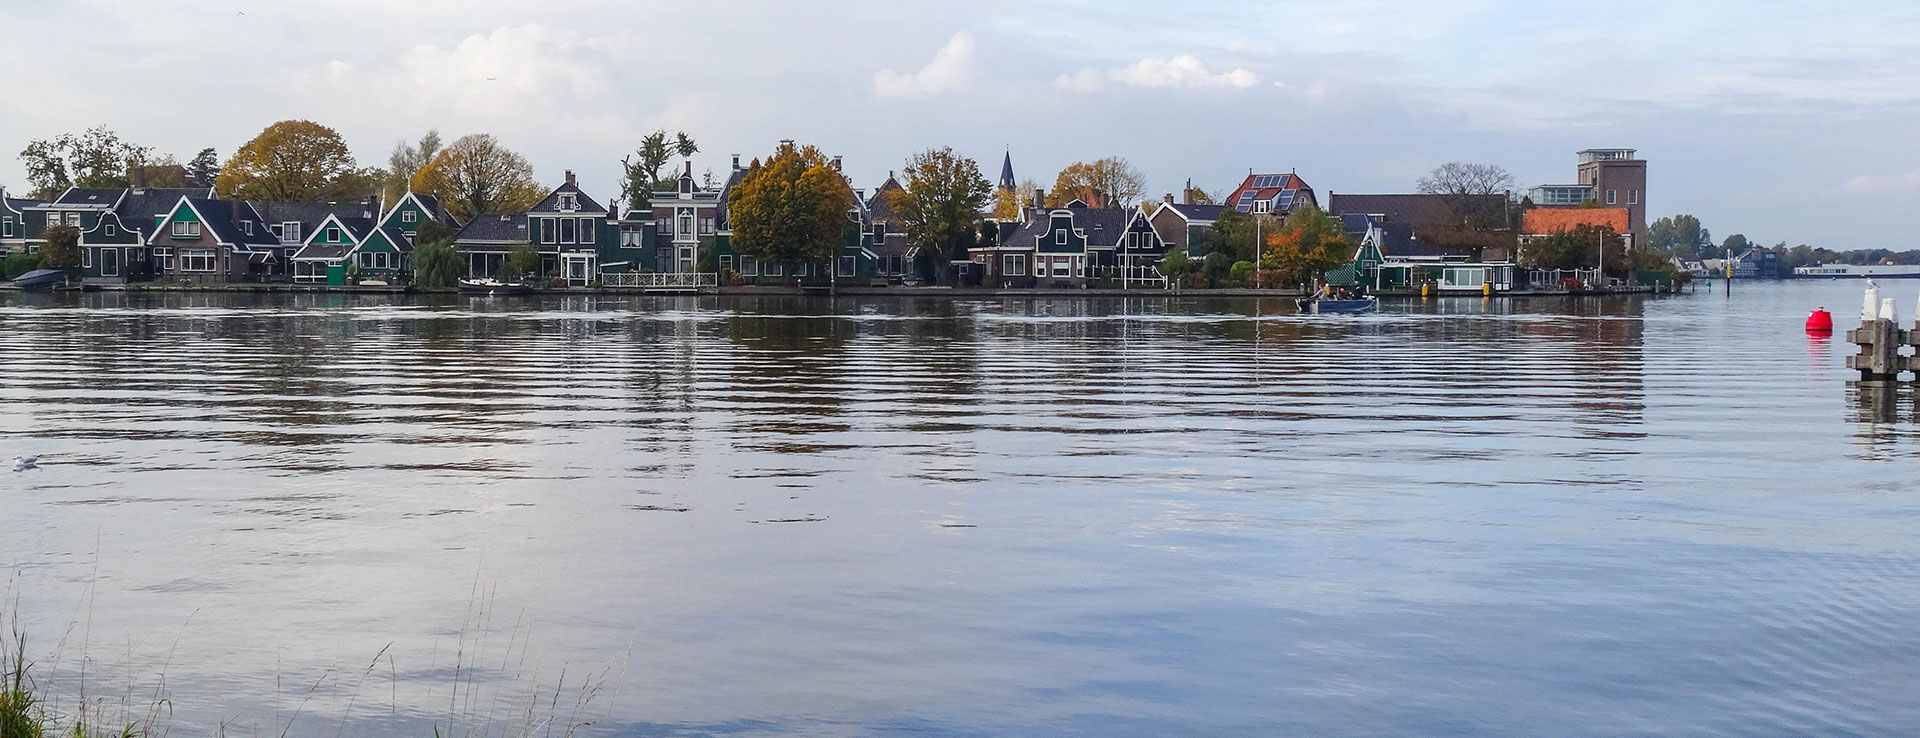 Travel Photostory – Amsterdam